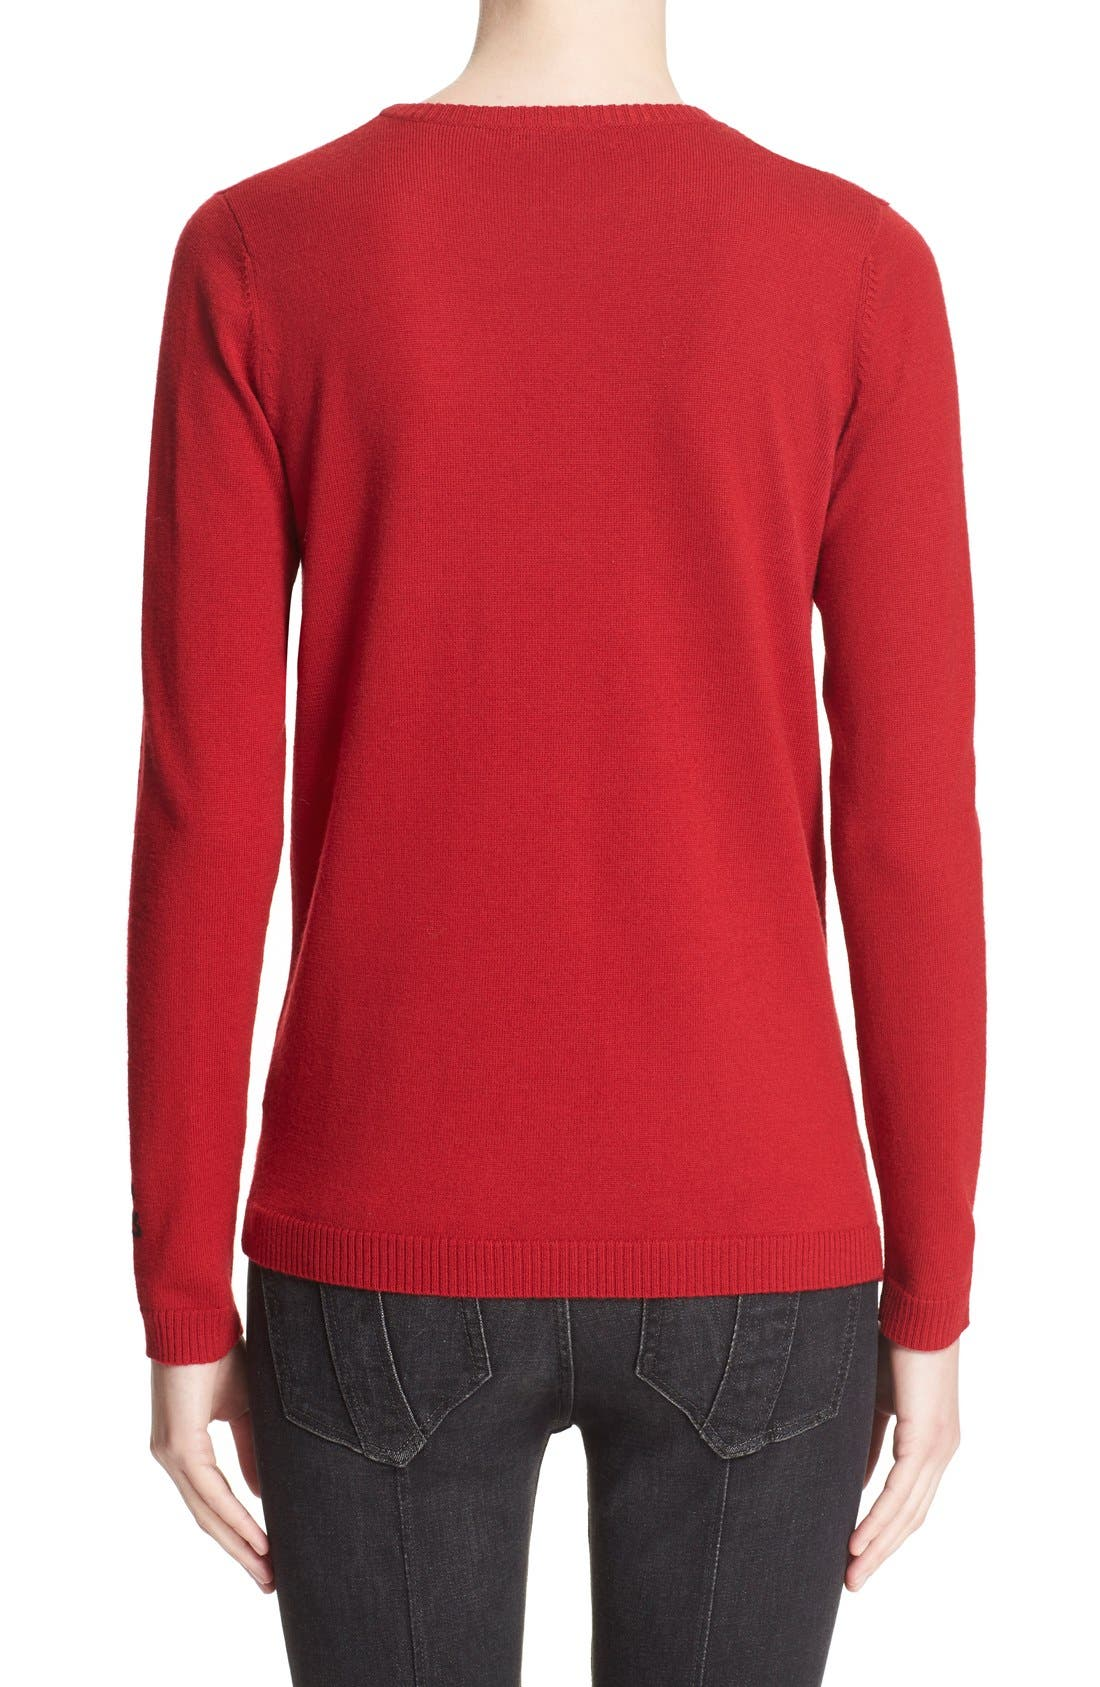 Alternate Image 2  - Bella Freud 'Star Studded' Crewneck Wool Sweater